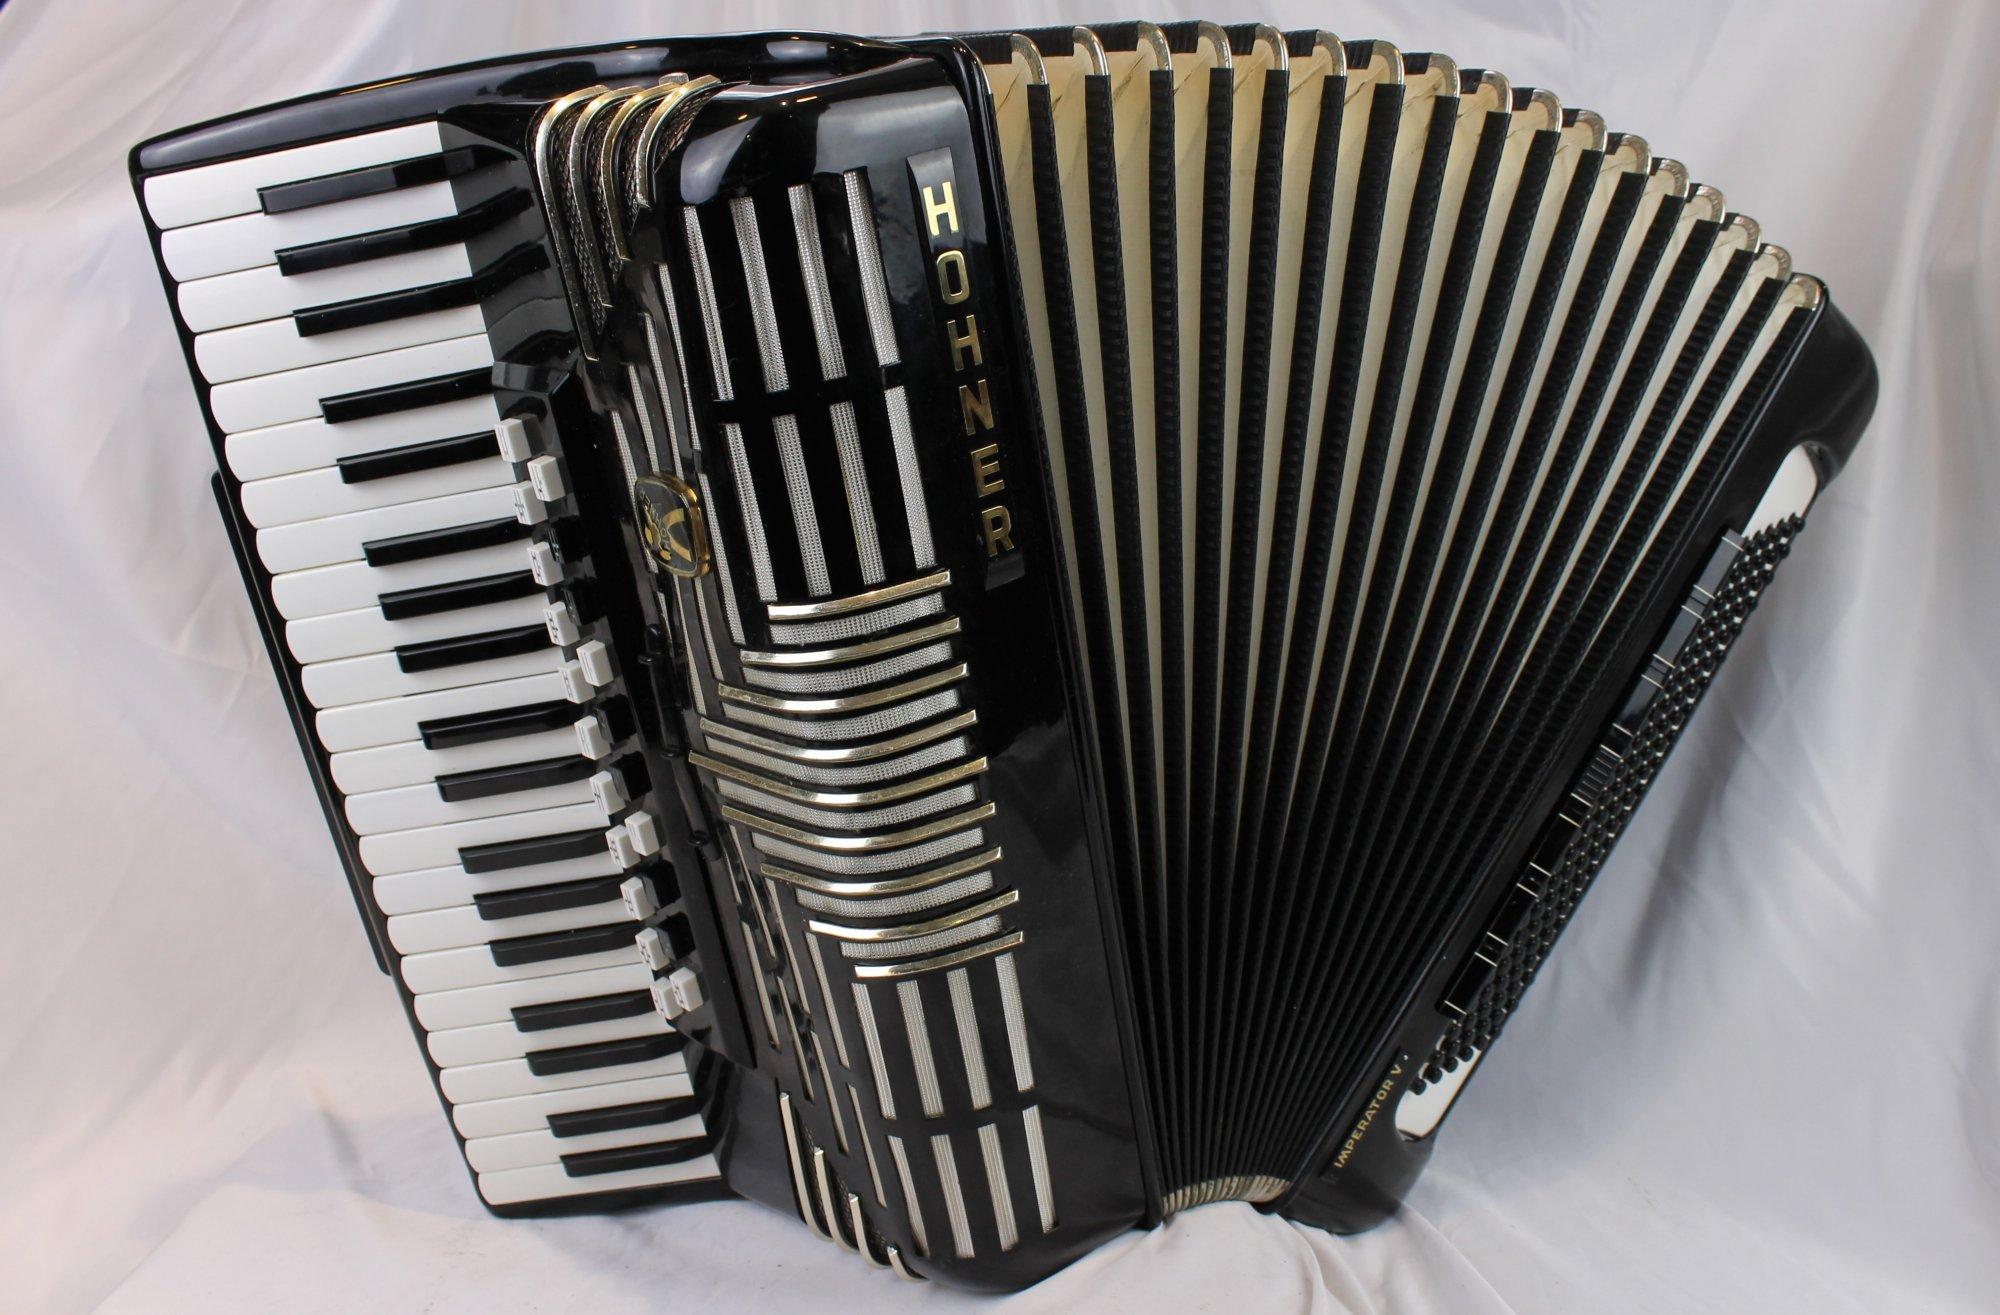 3908 - Black Hohner Imperator V Piano Accordion LMMMH 41 120